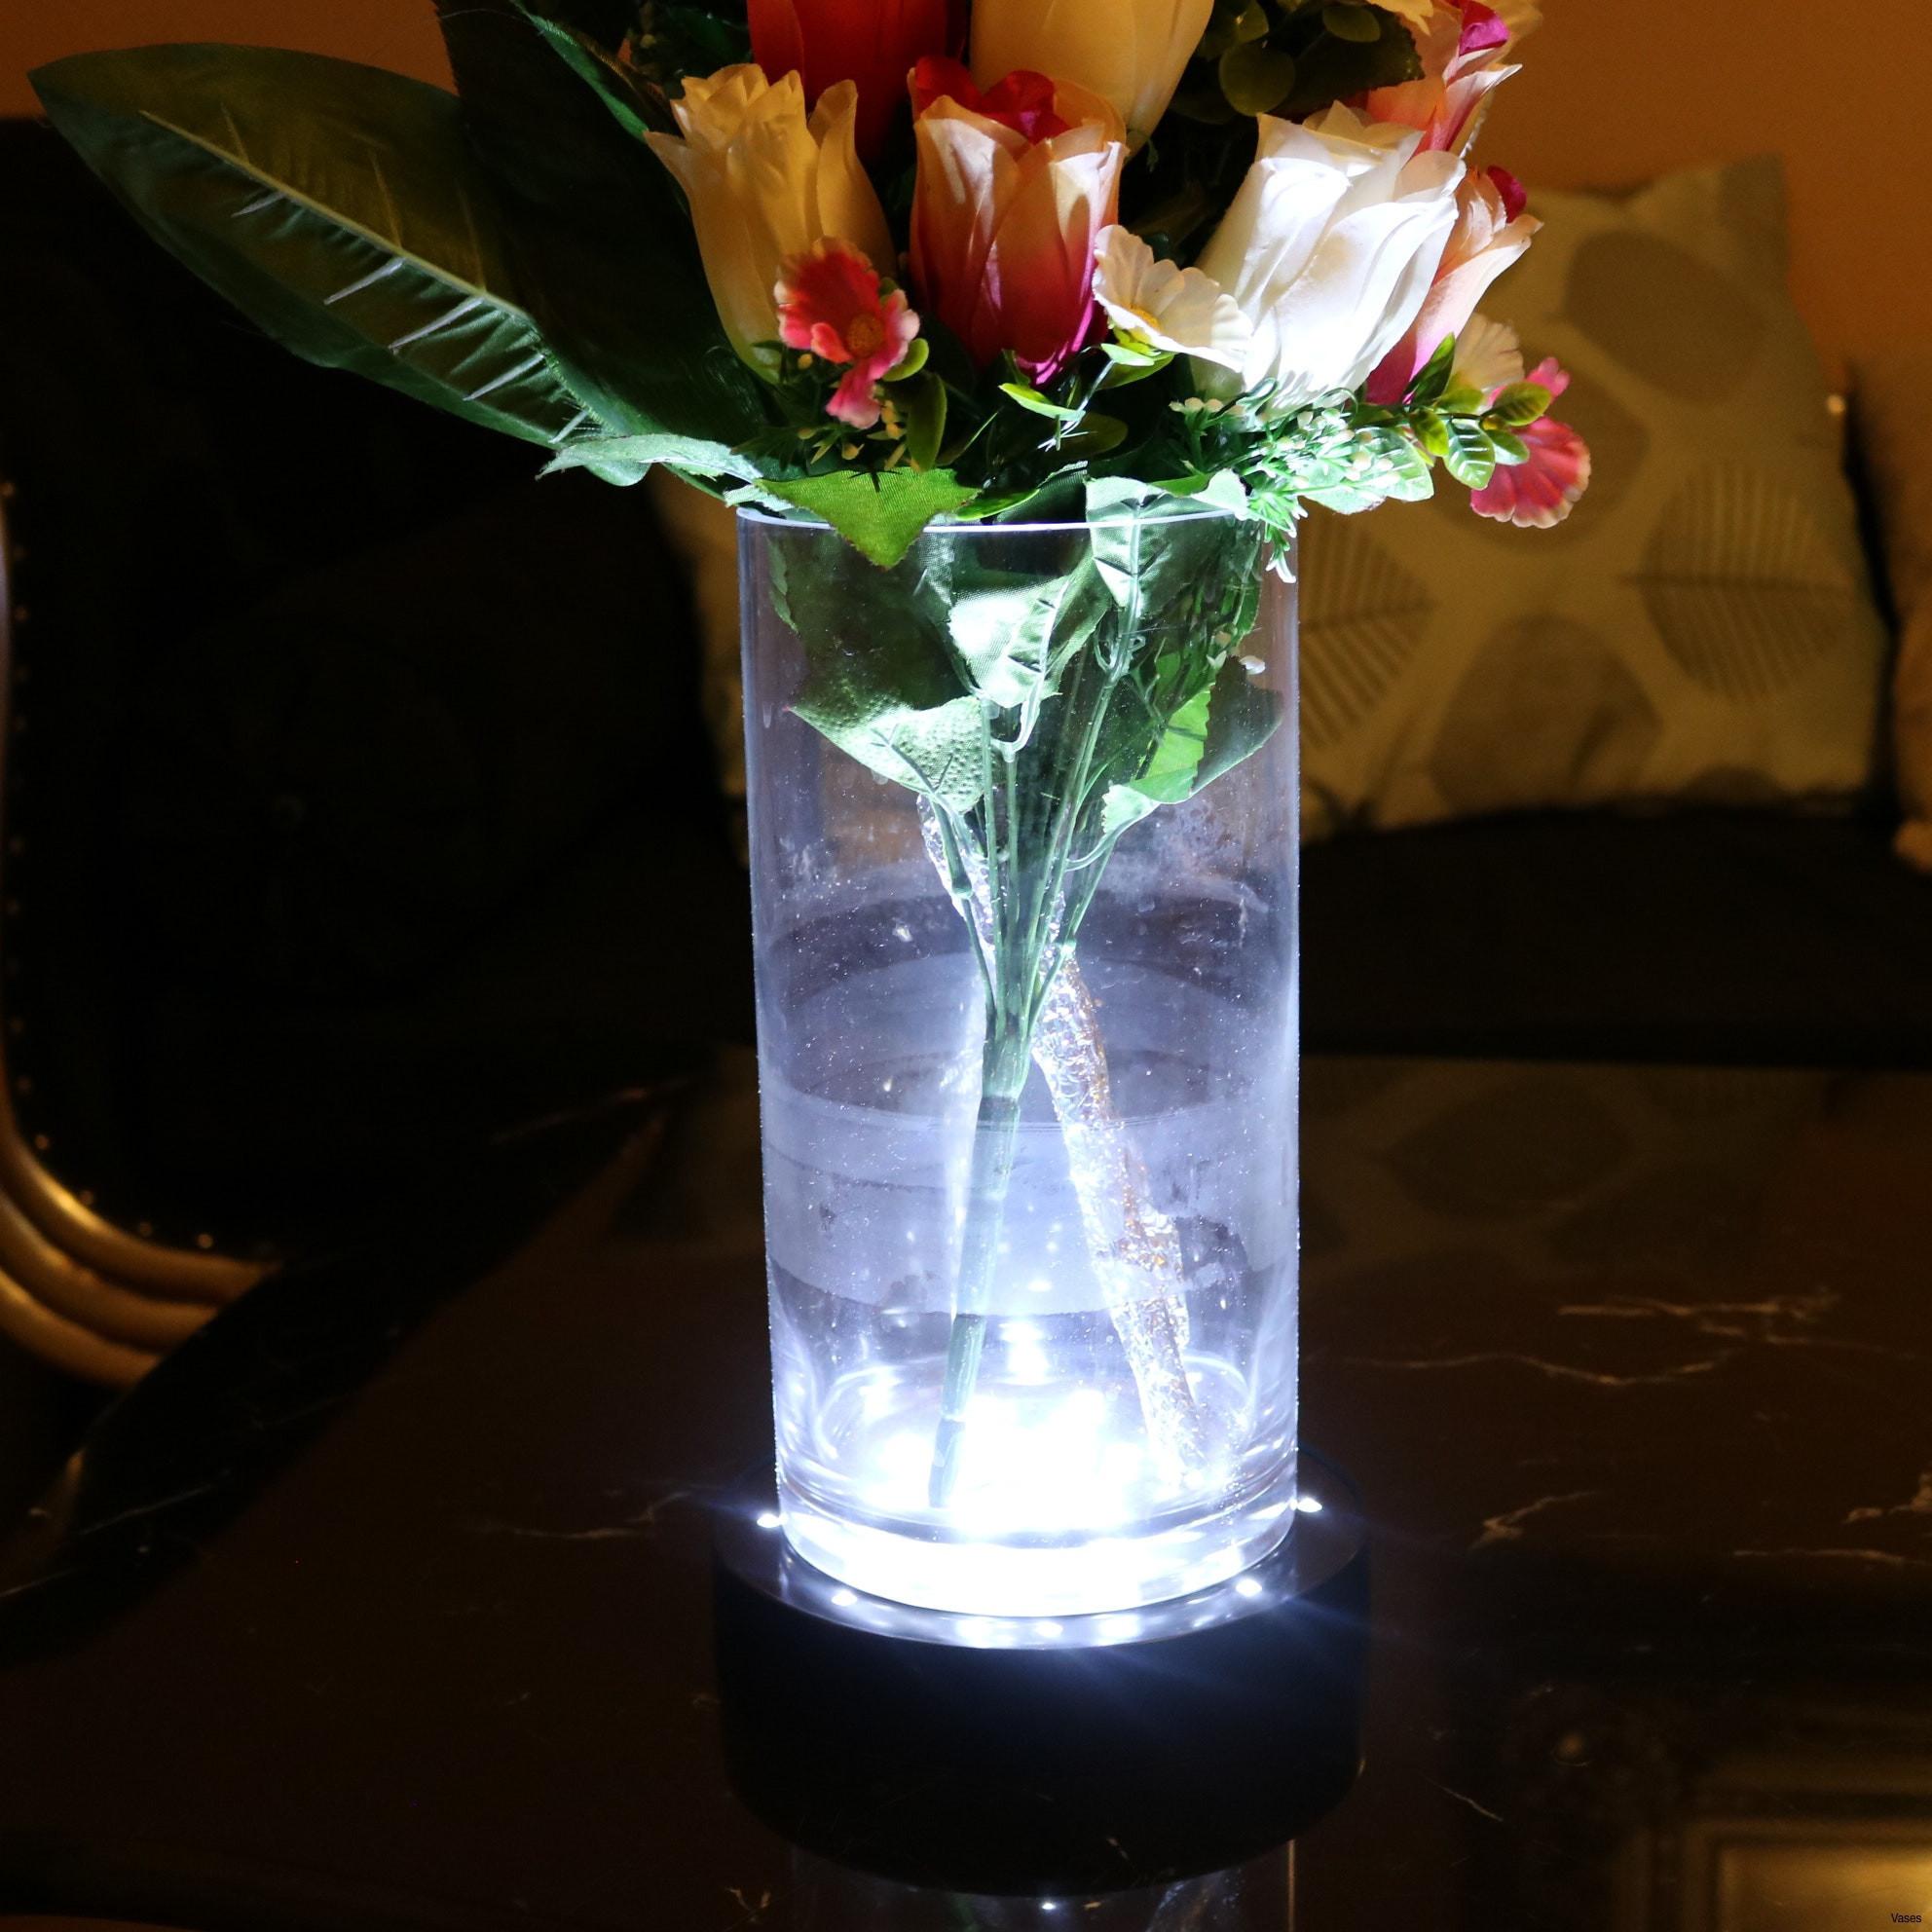 fenton cranberry glass vase of rose bowl vase photograph cheap plastic rectangular planters unique pertaining to cheap plastic rectangular planters unique vases disposable plastic glass